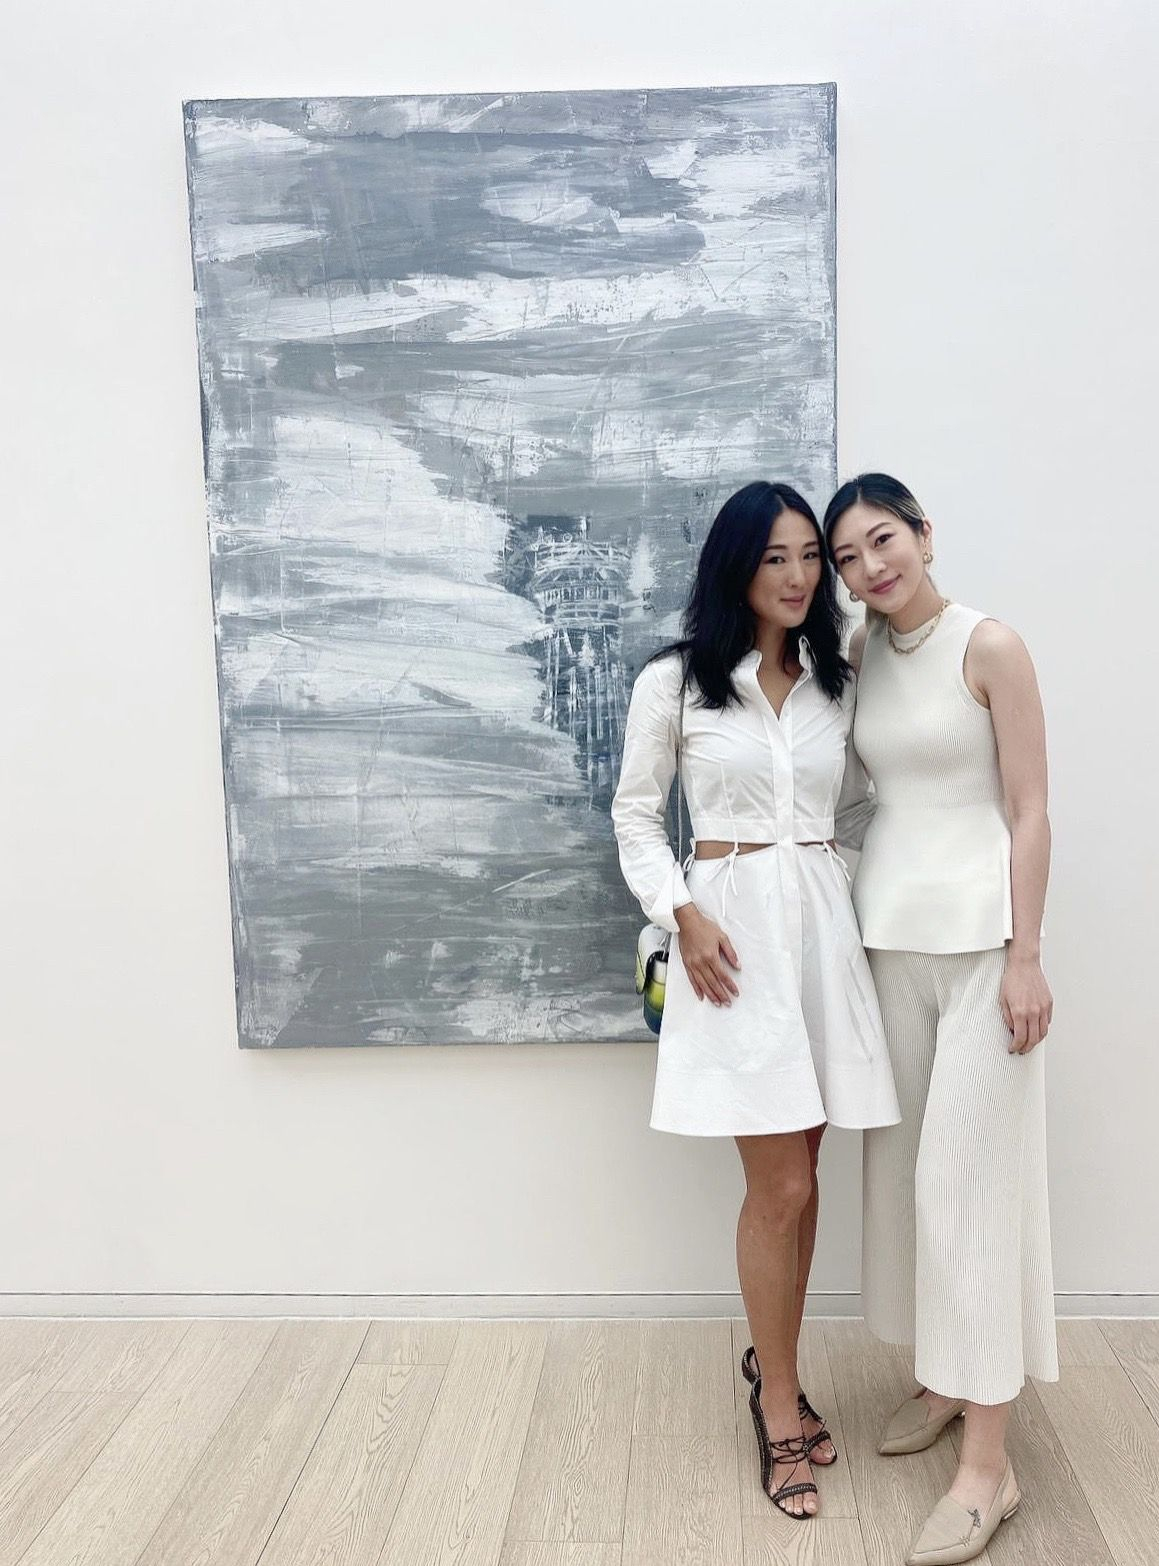 Antonia Li and Yvonne Fong